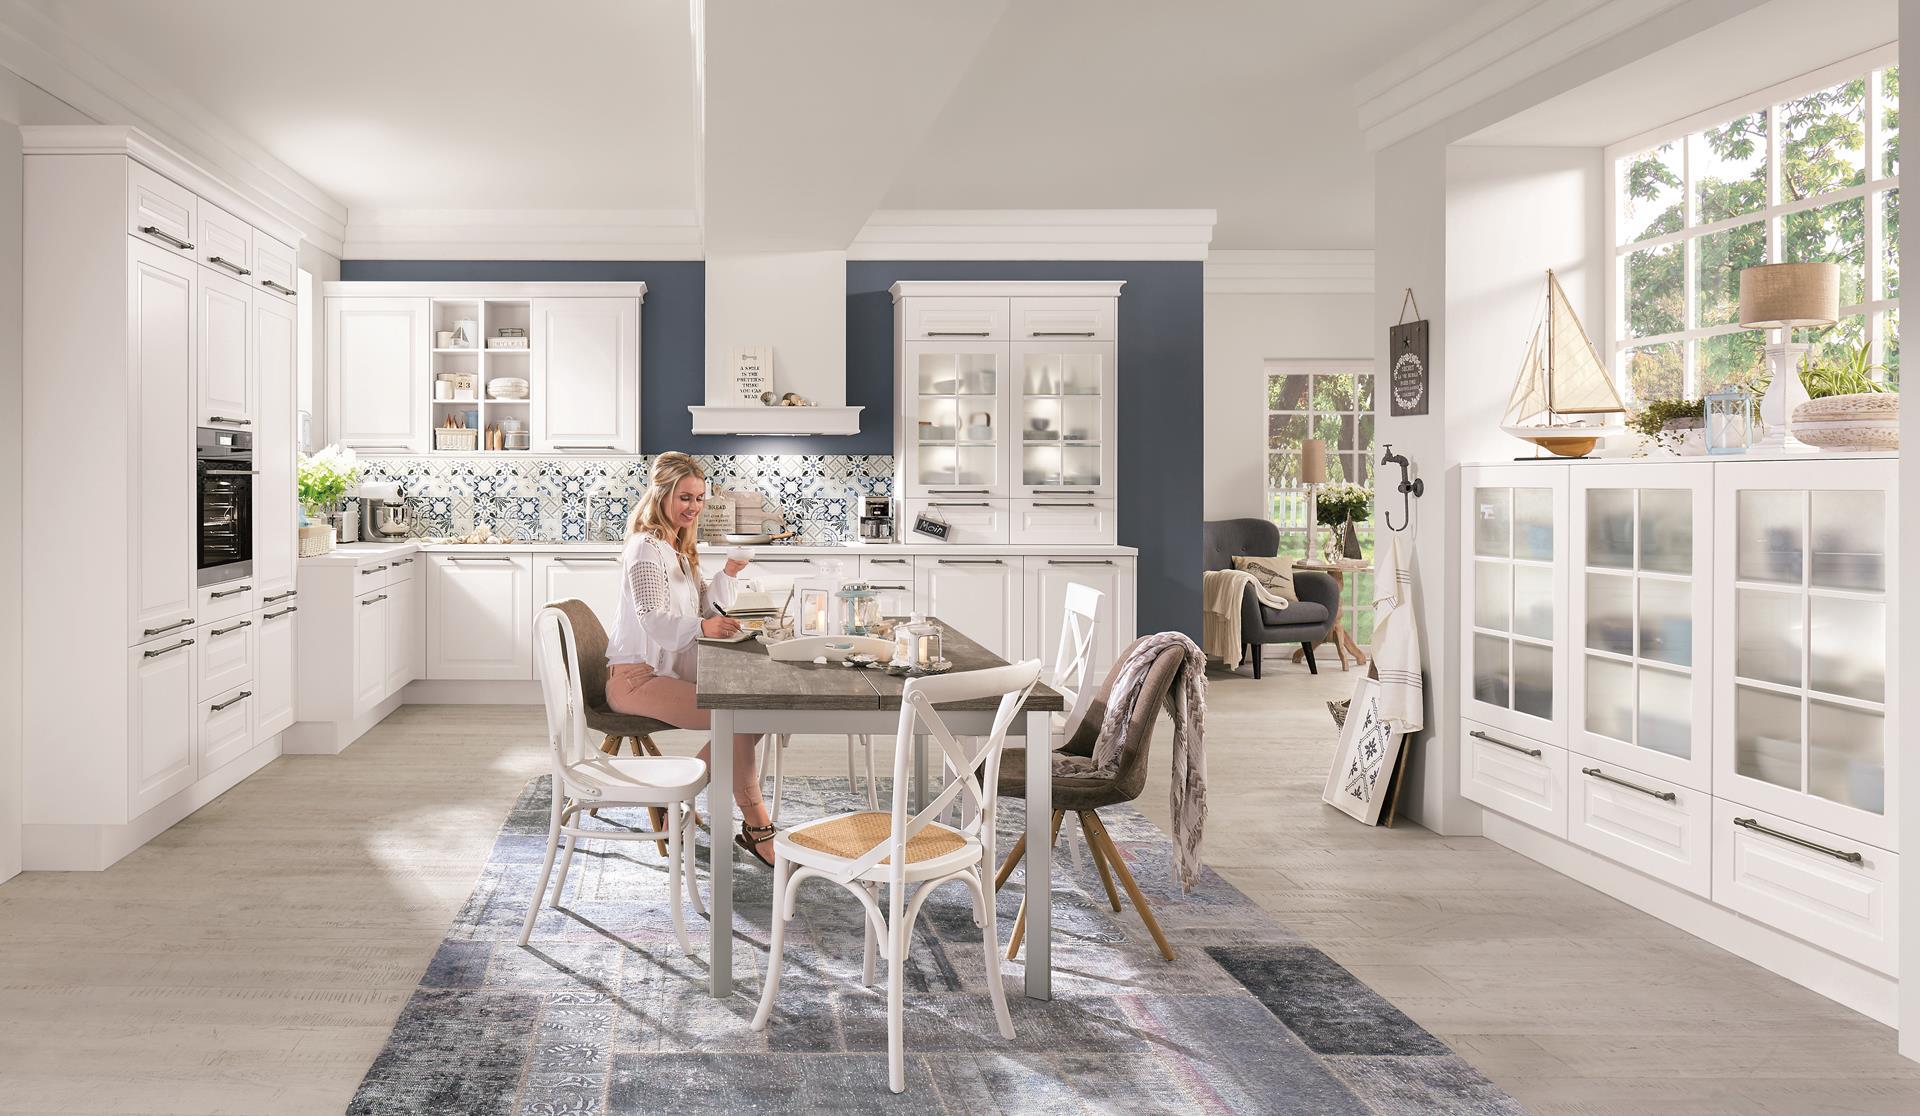 Muebles tenerife norte obtenga ideas dise o de muebles para su hogar aqu - Apartamentos baratos en tenerife norte ...